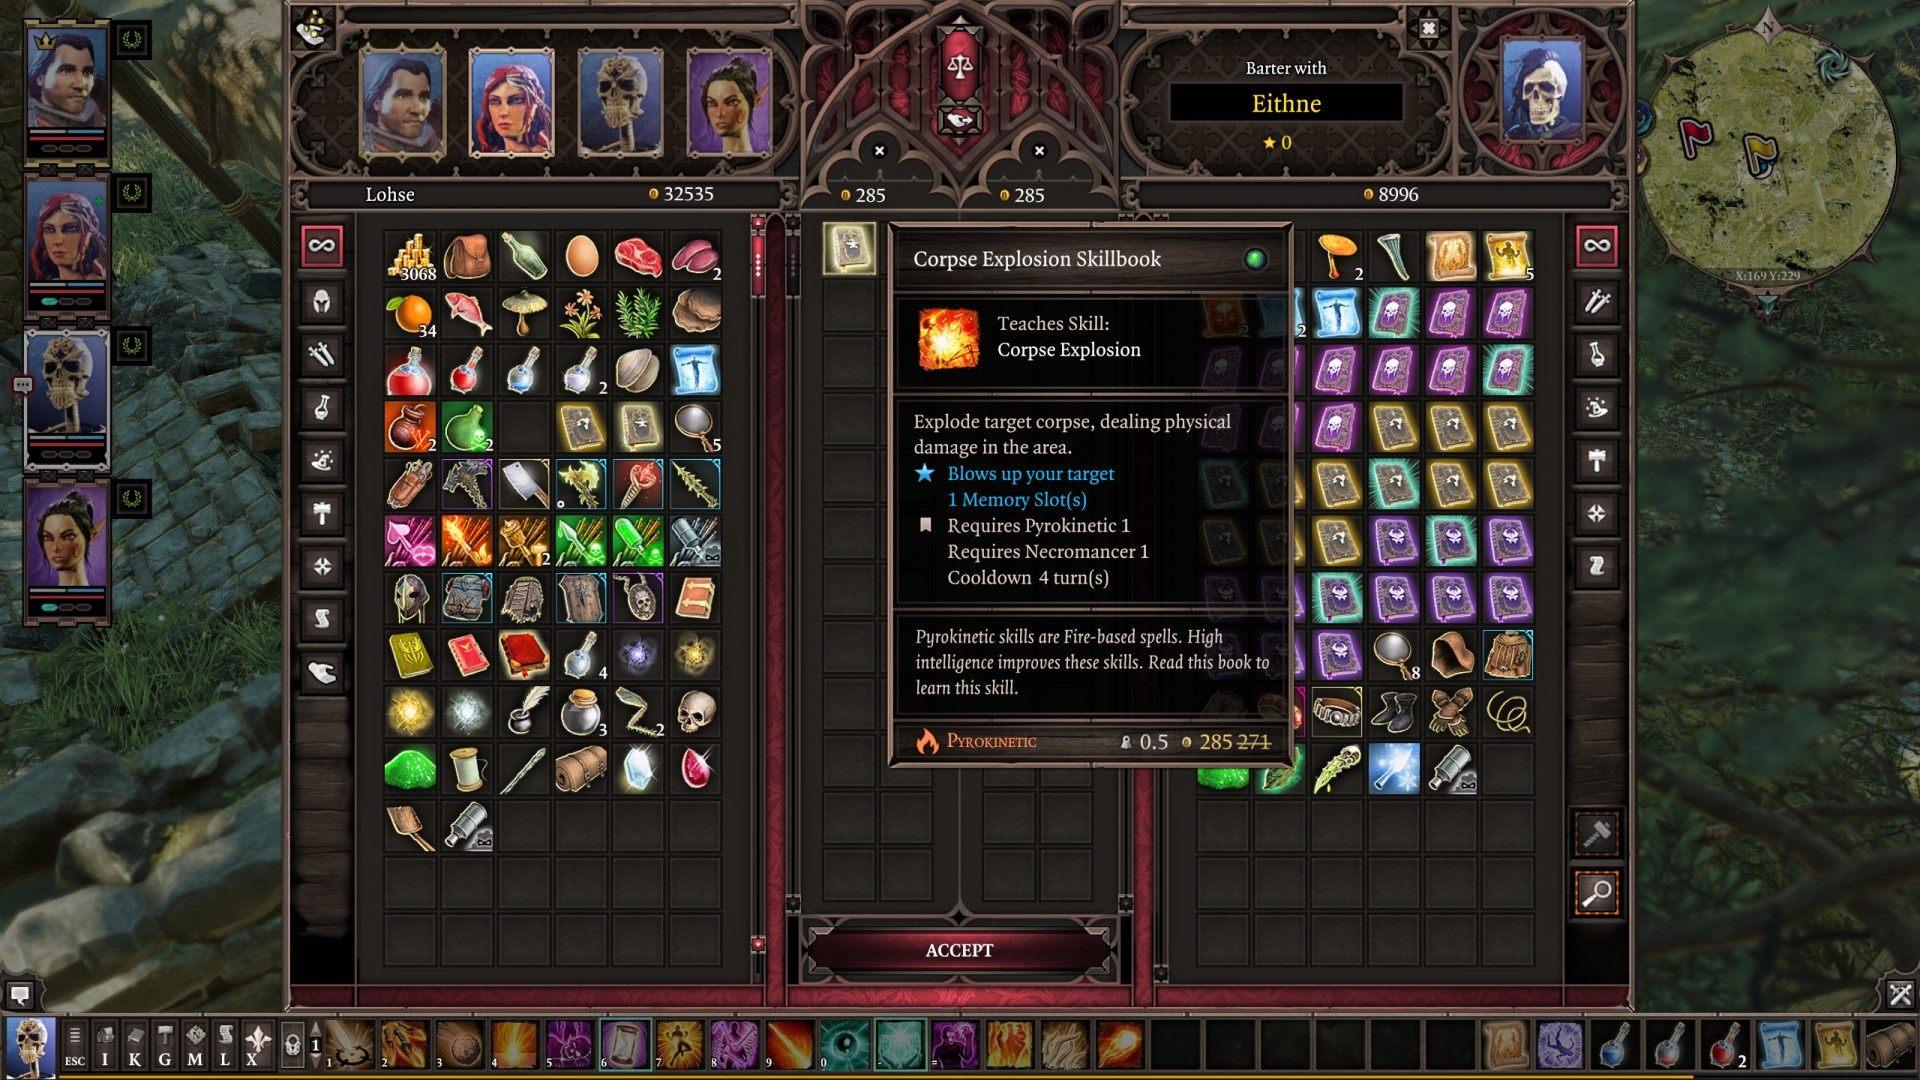 Eithne the Trader, Divinity: Original Sin 2 Quest